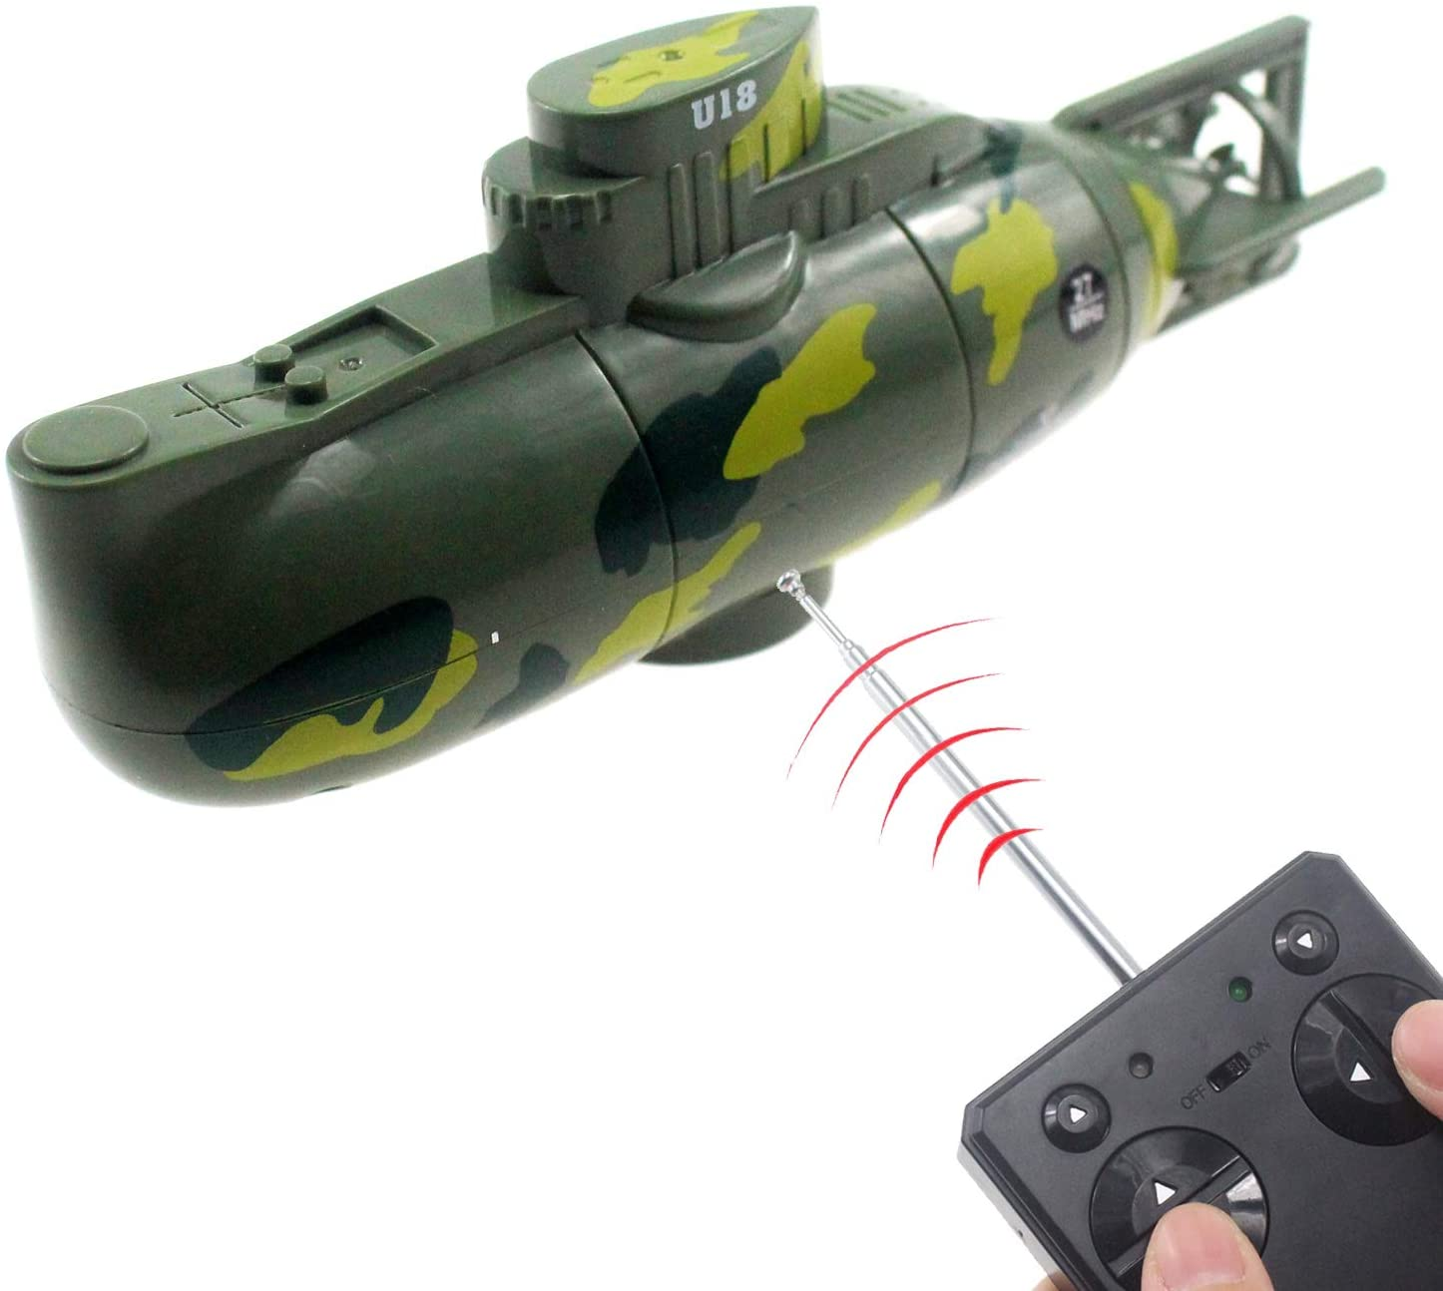 Submarino De Cuatro Canales Juguete El/éctrico Subacu/ático con 3 Luces LED qianqian Submarino A Control Remoto para Ba/ñera Piscina